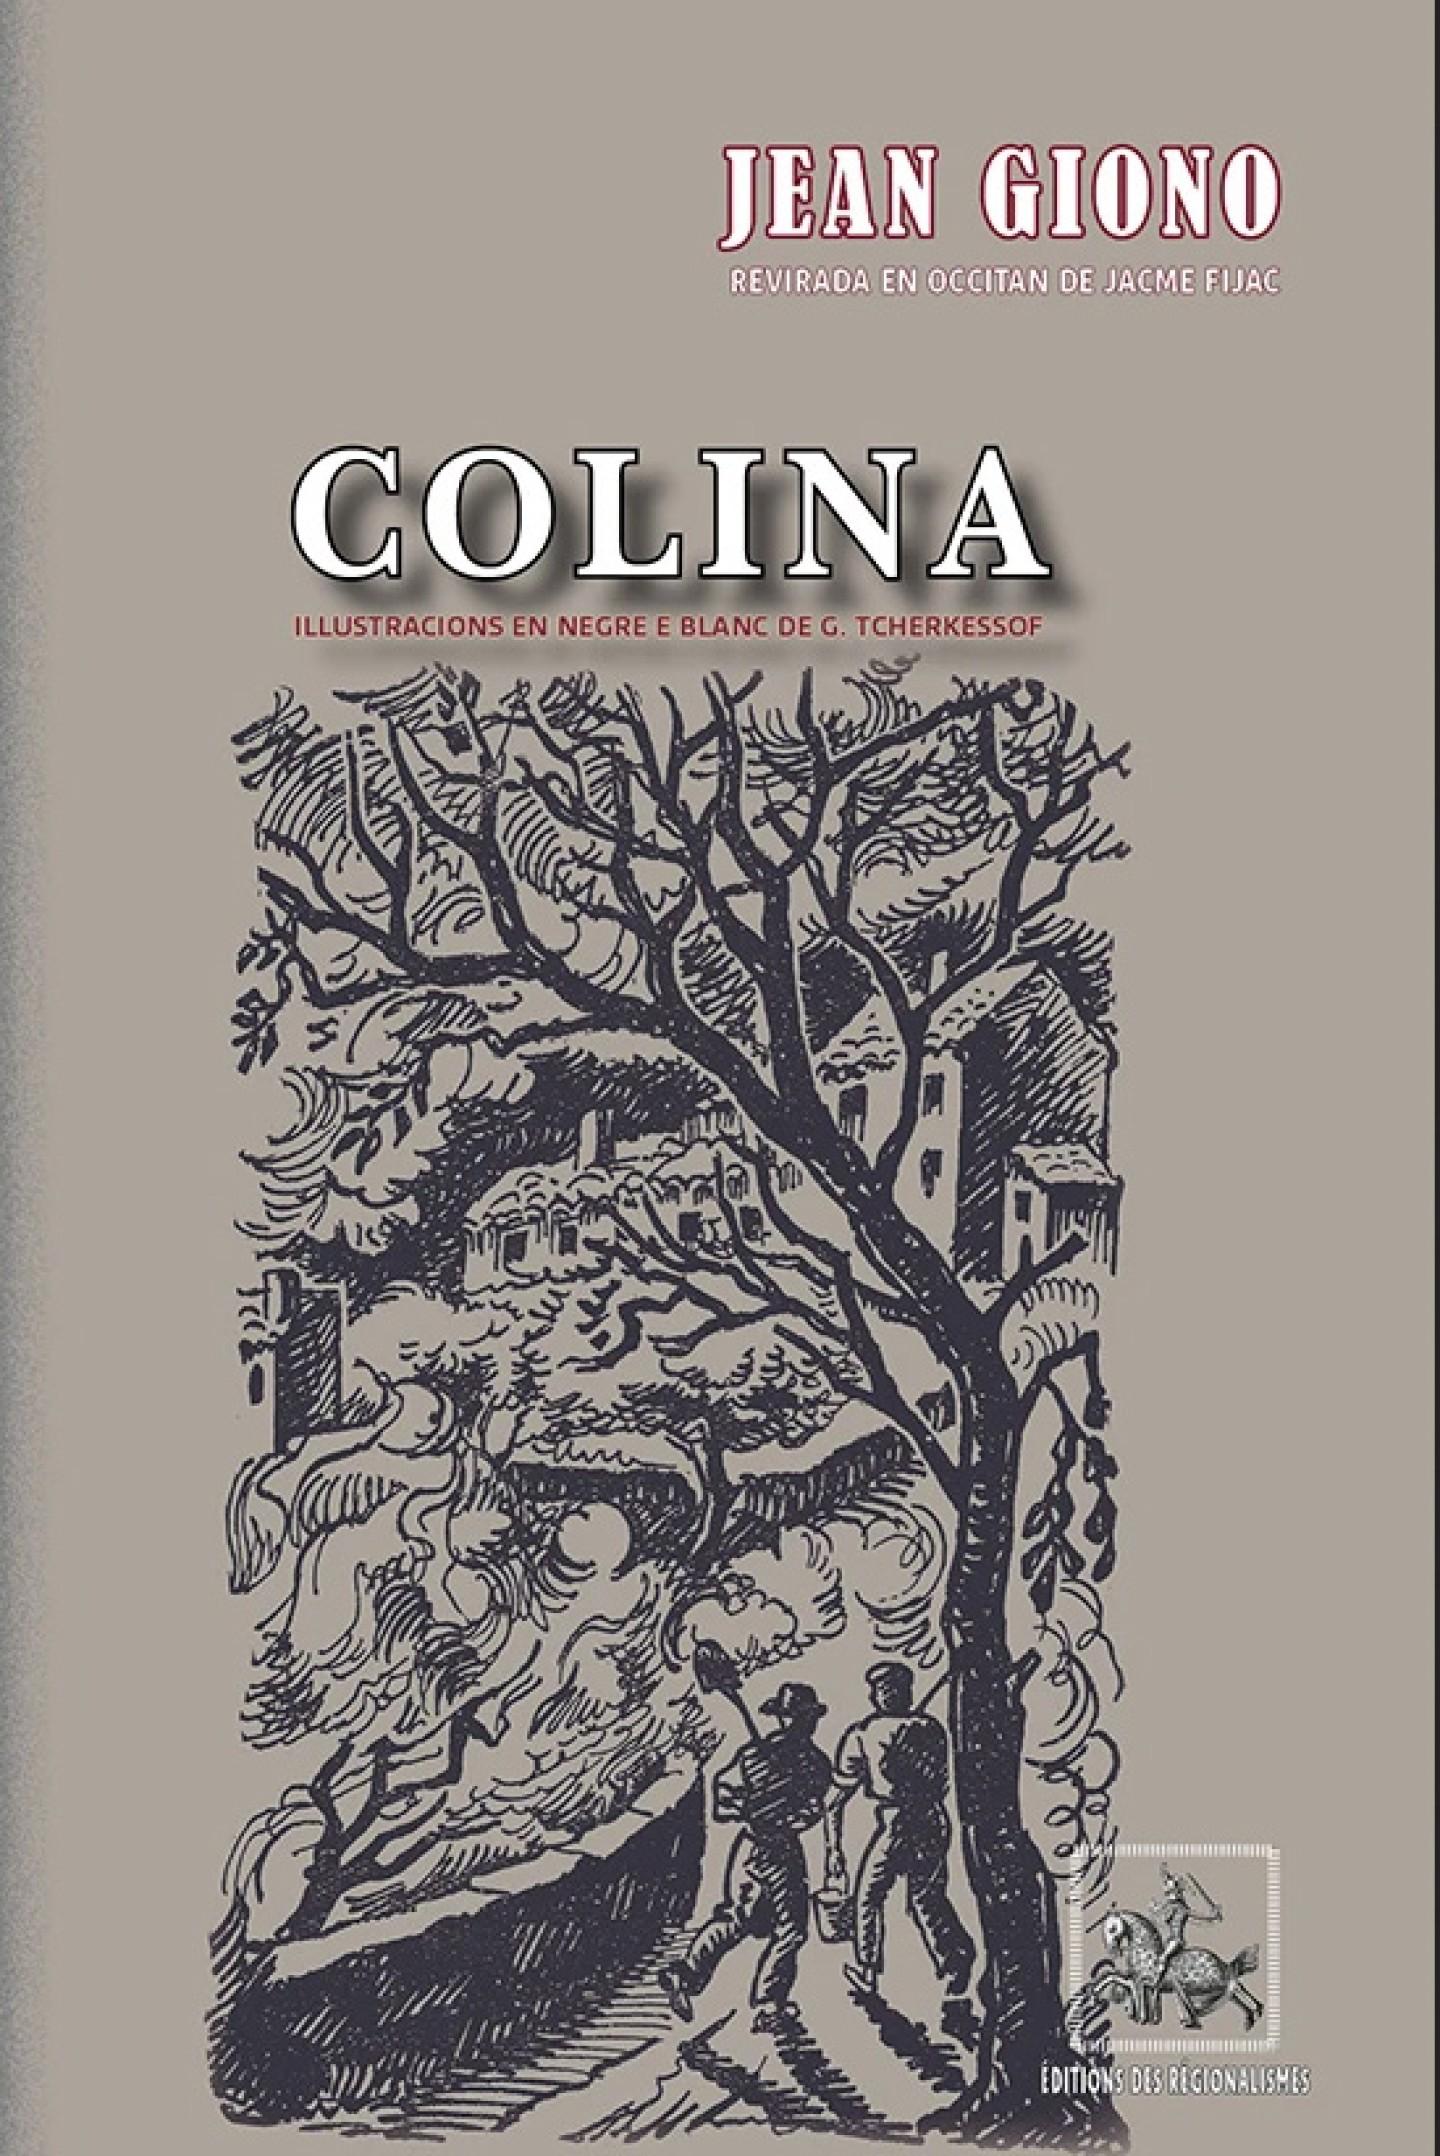 Colina de Jean Giono, traduction de Jacme Fijac